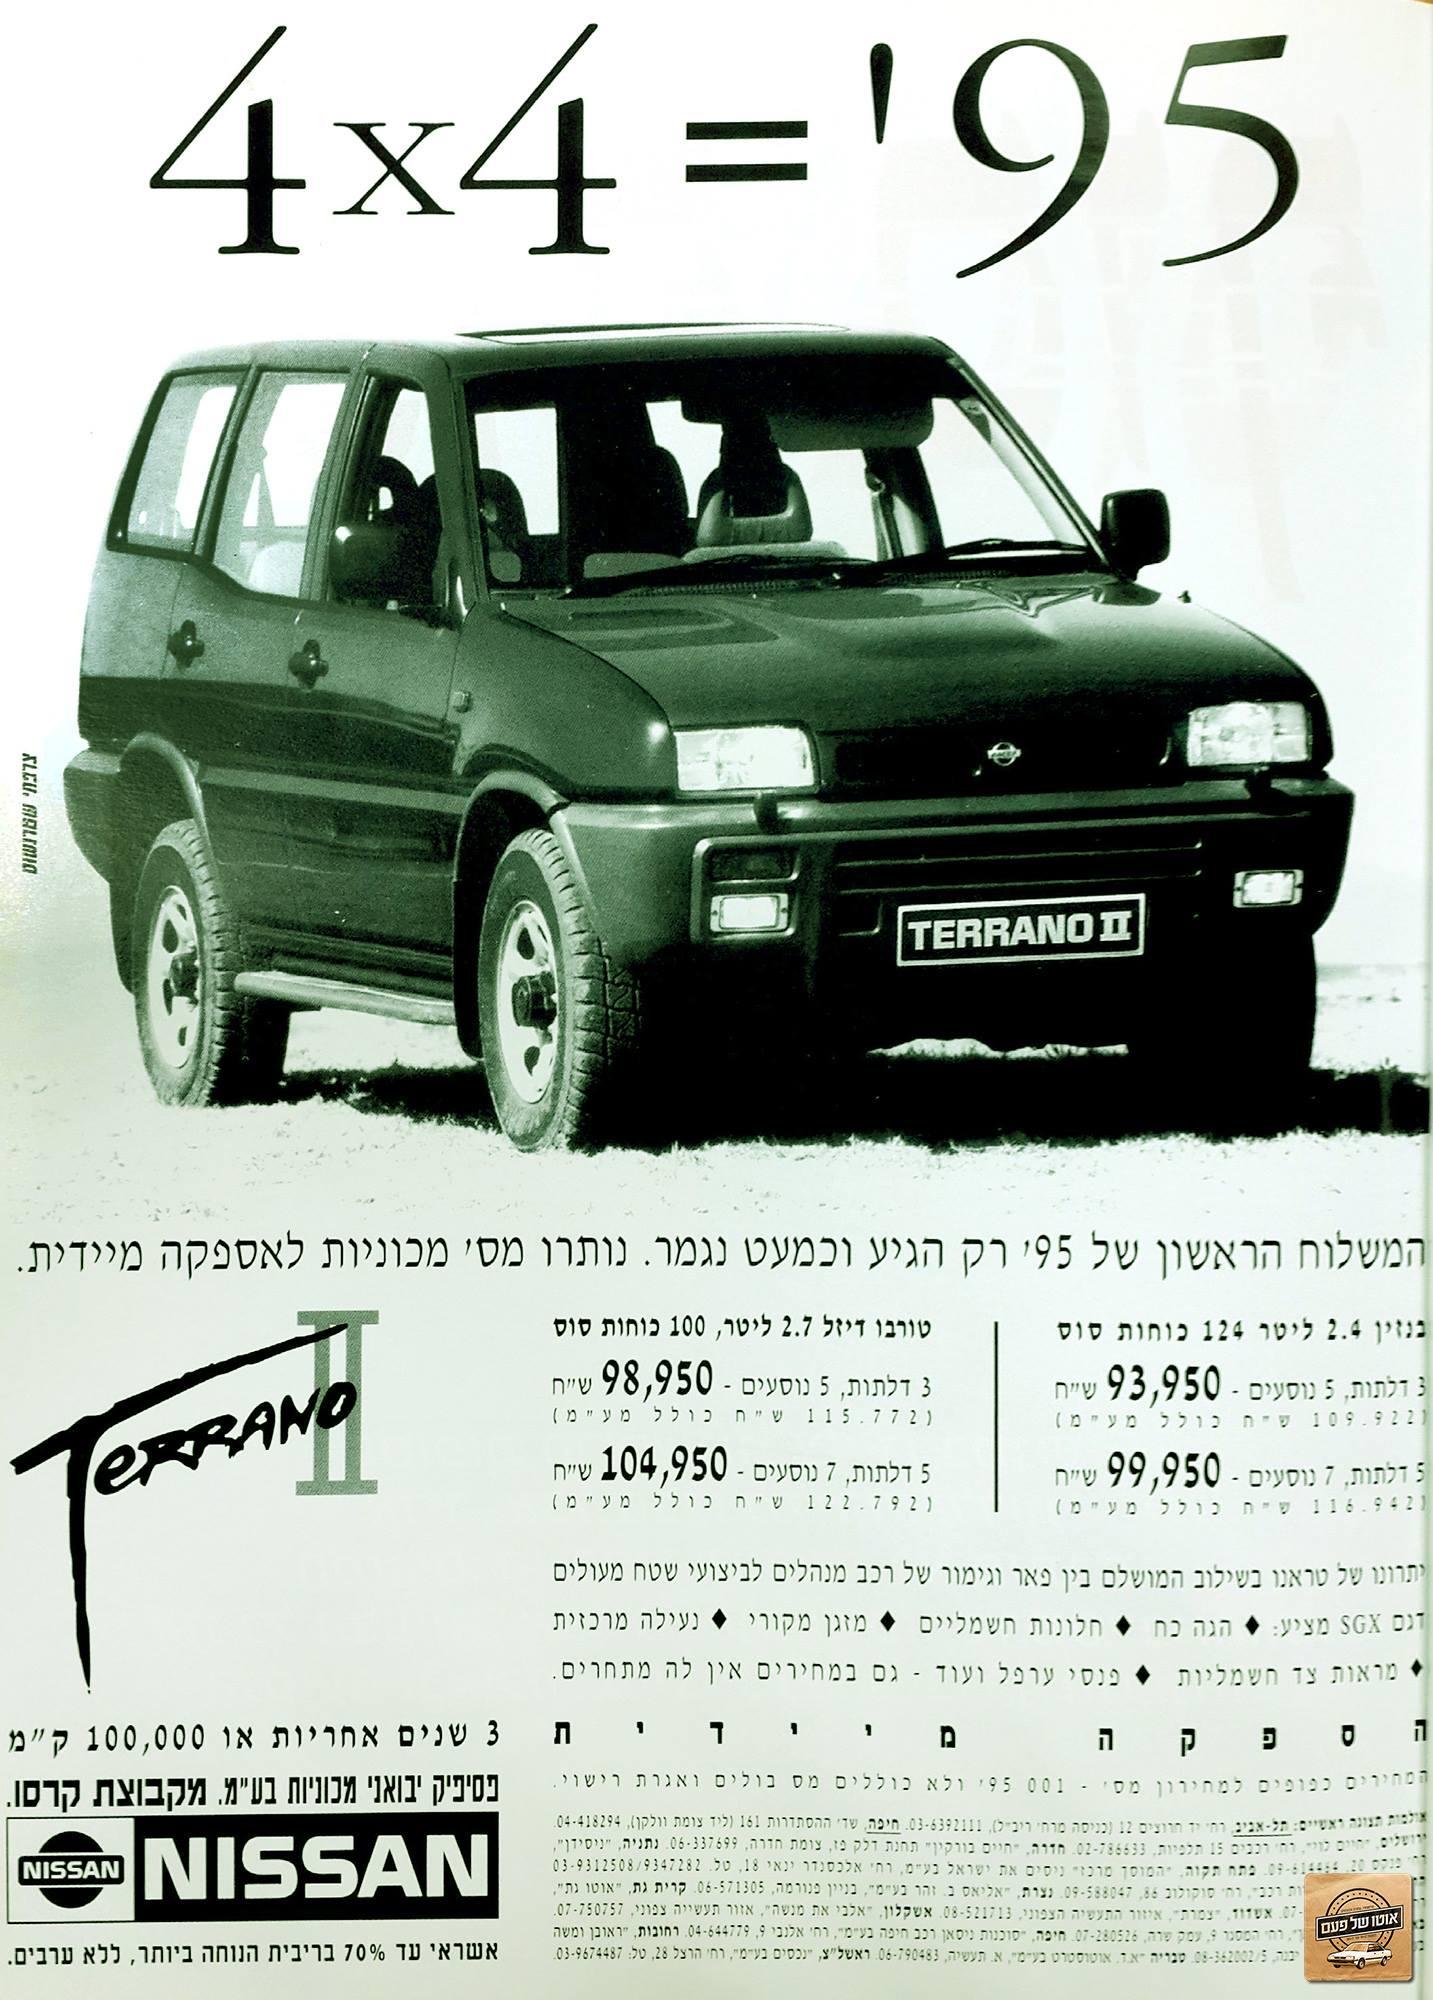 ניסאן טראנו 1995